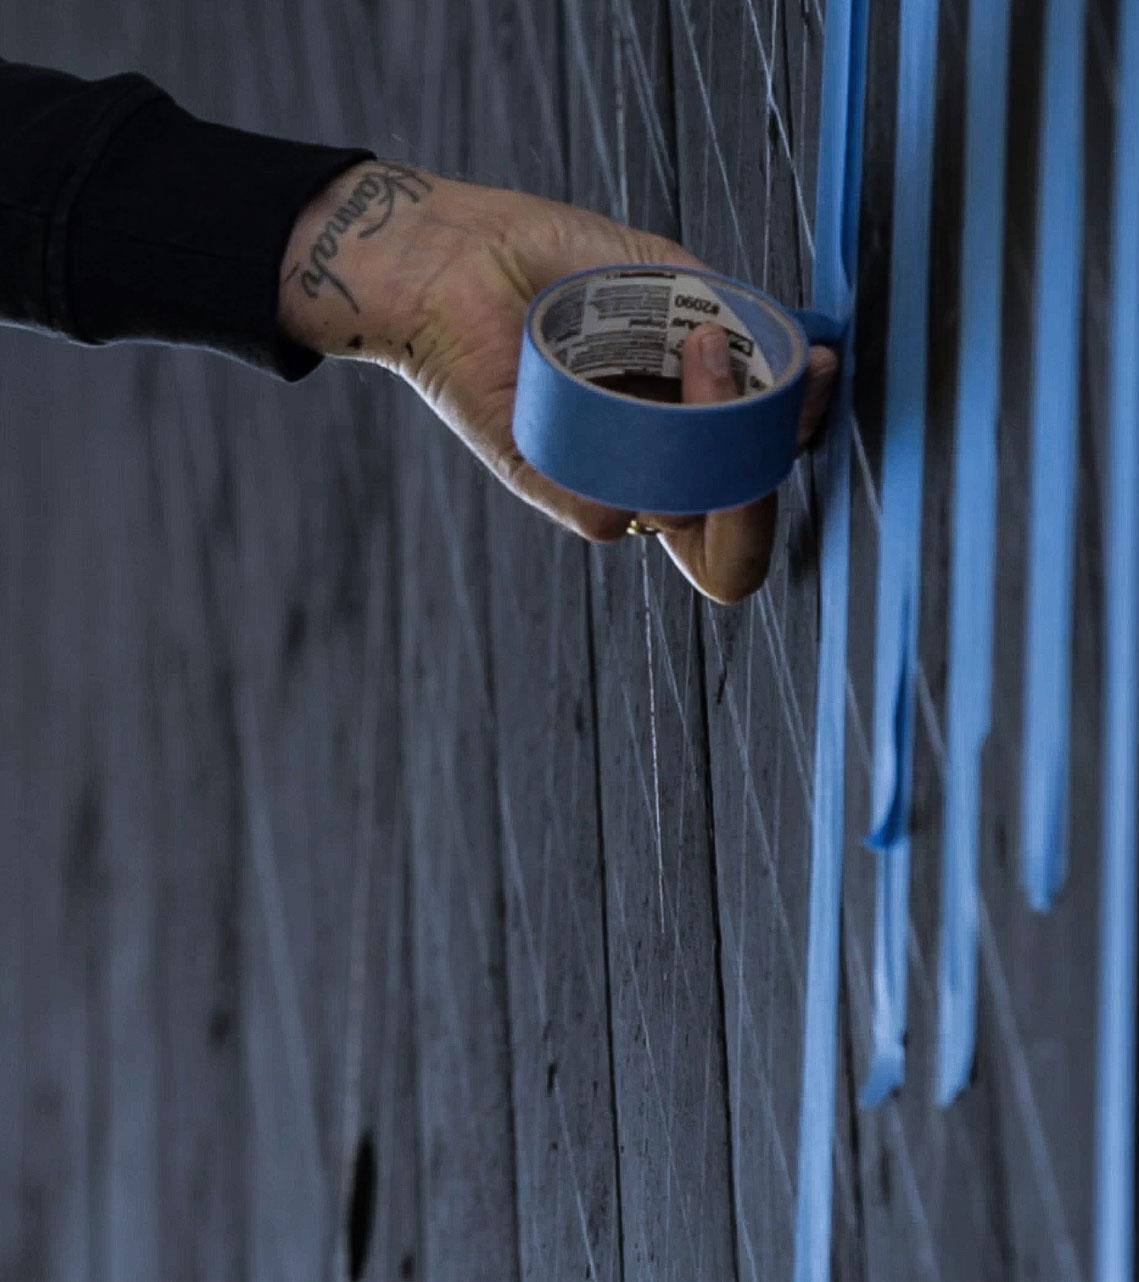 Upside Gallery_Gary Stranger graffiti artist close up of hand